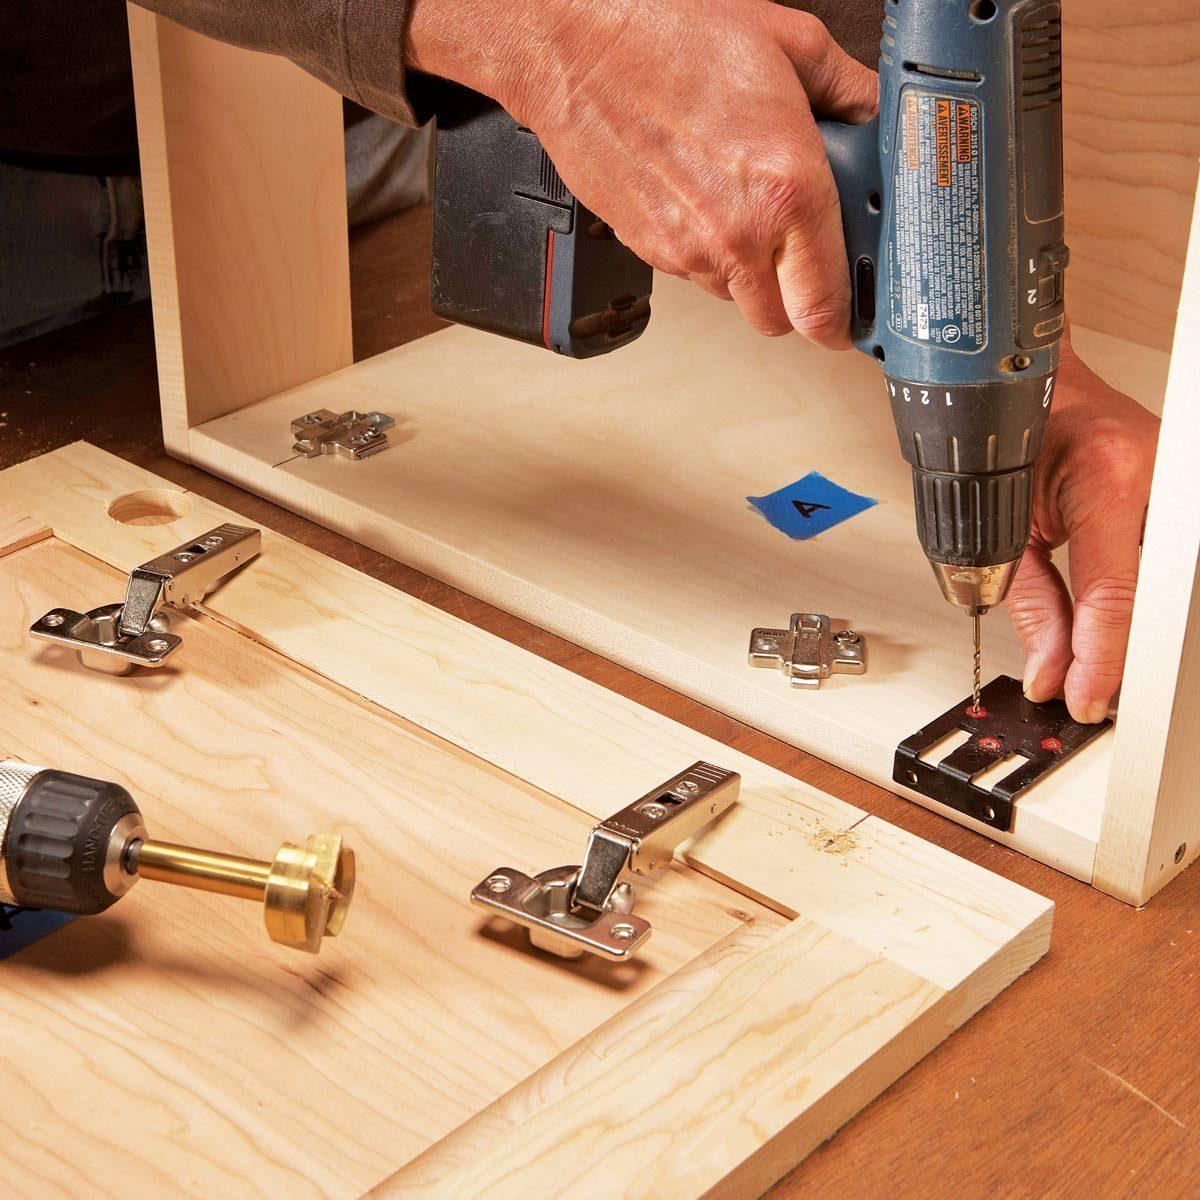 Drill shallow starter holes